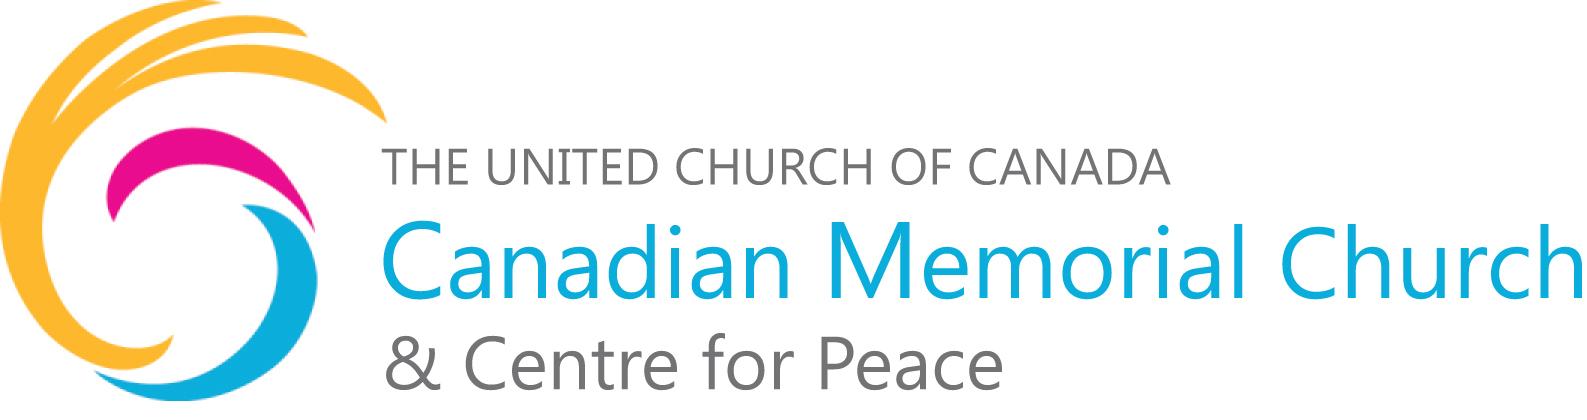 Canadian Memorial Church logo